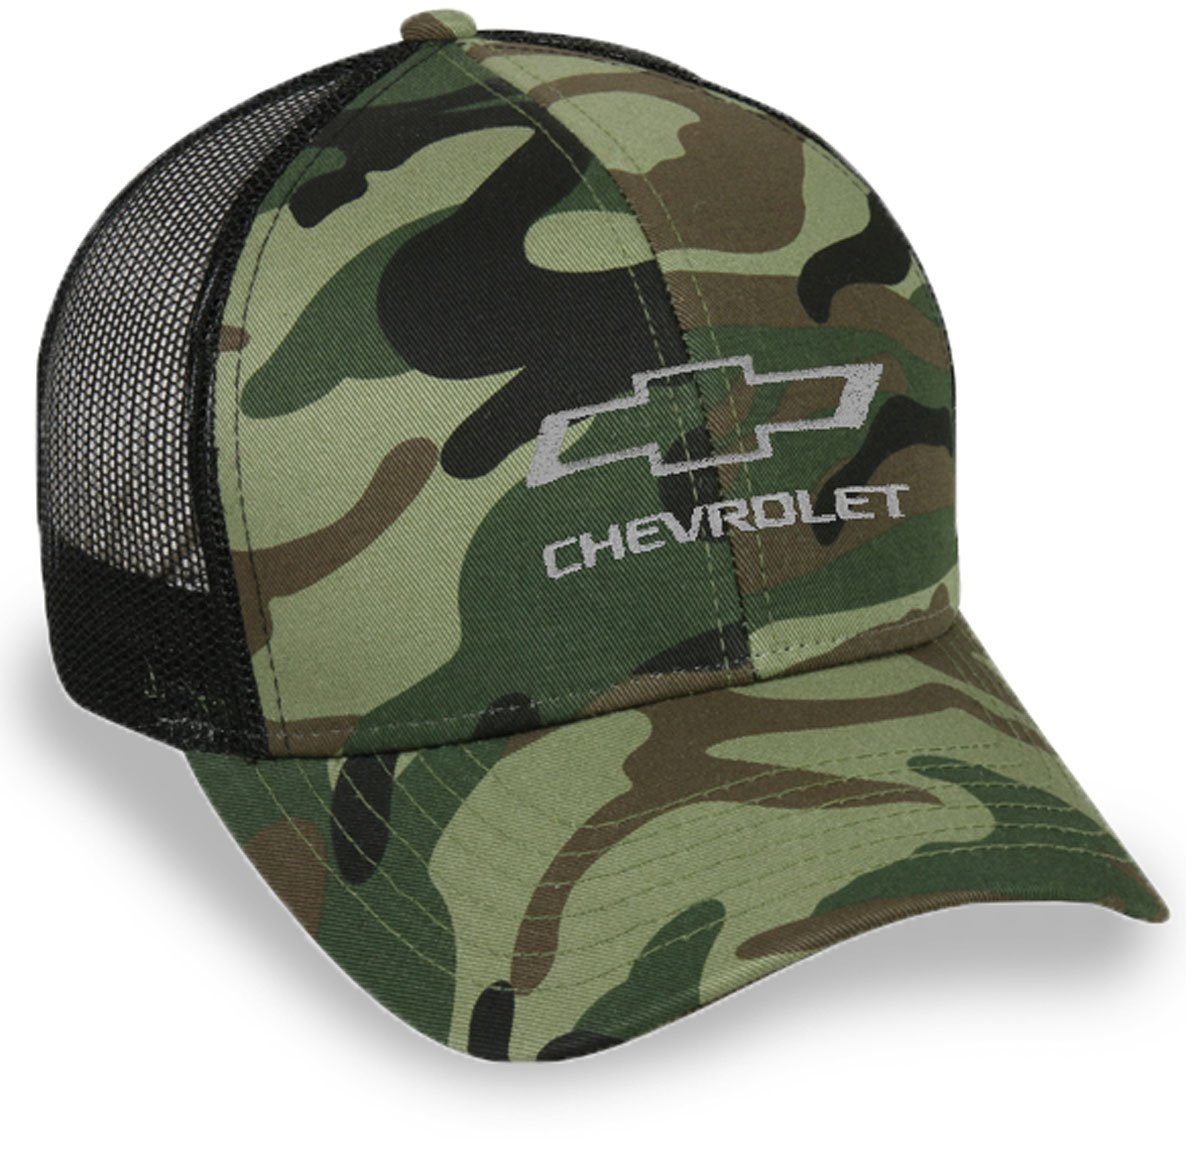 Bone Gregs Automotive Camaro Hat Bowtie Cap Bundle with Driving Style Decal